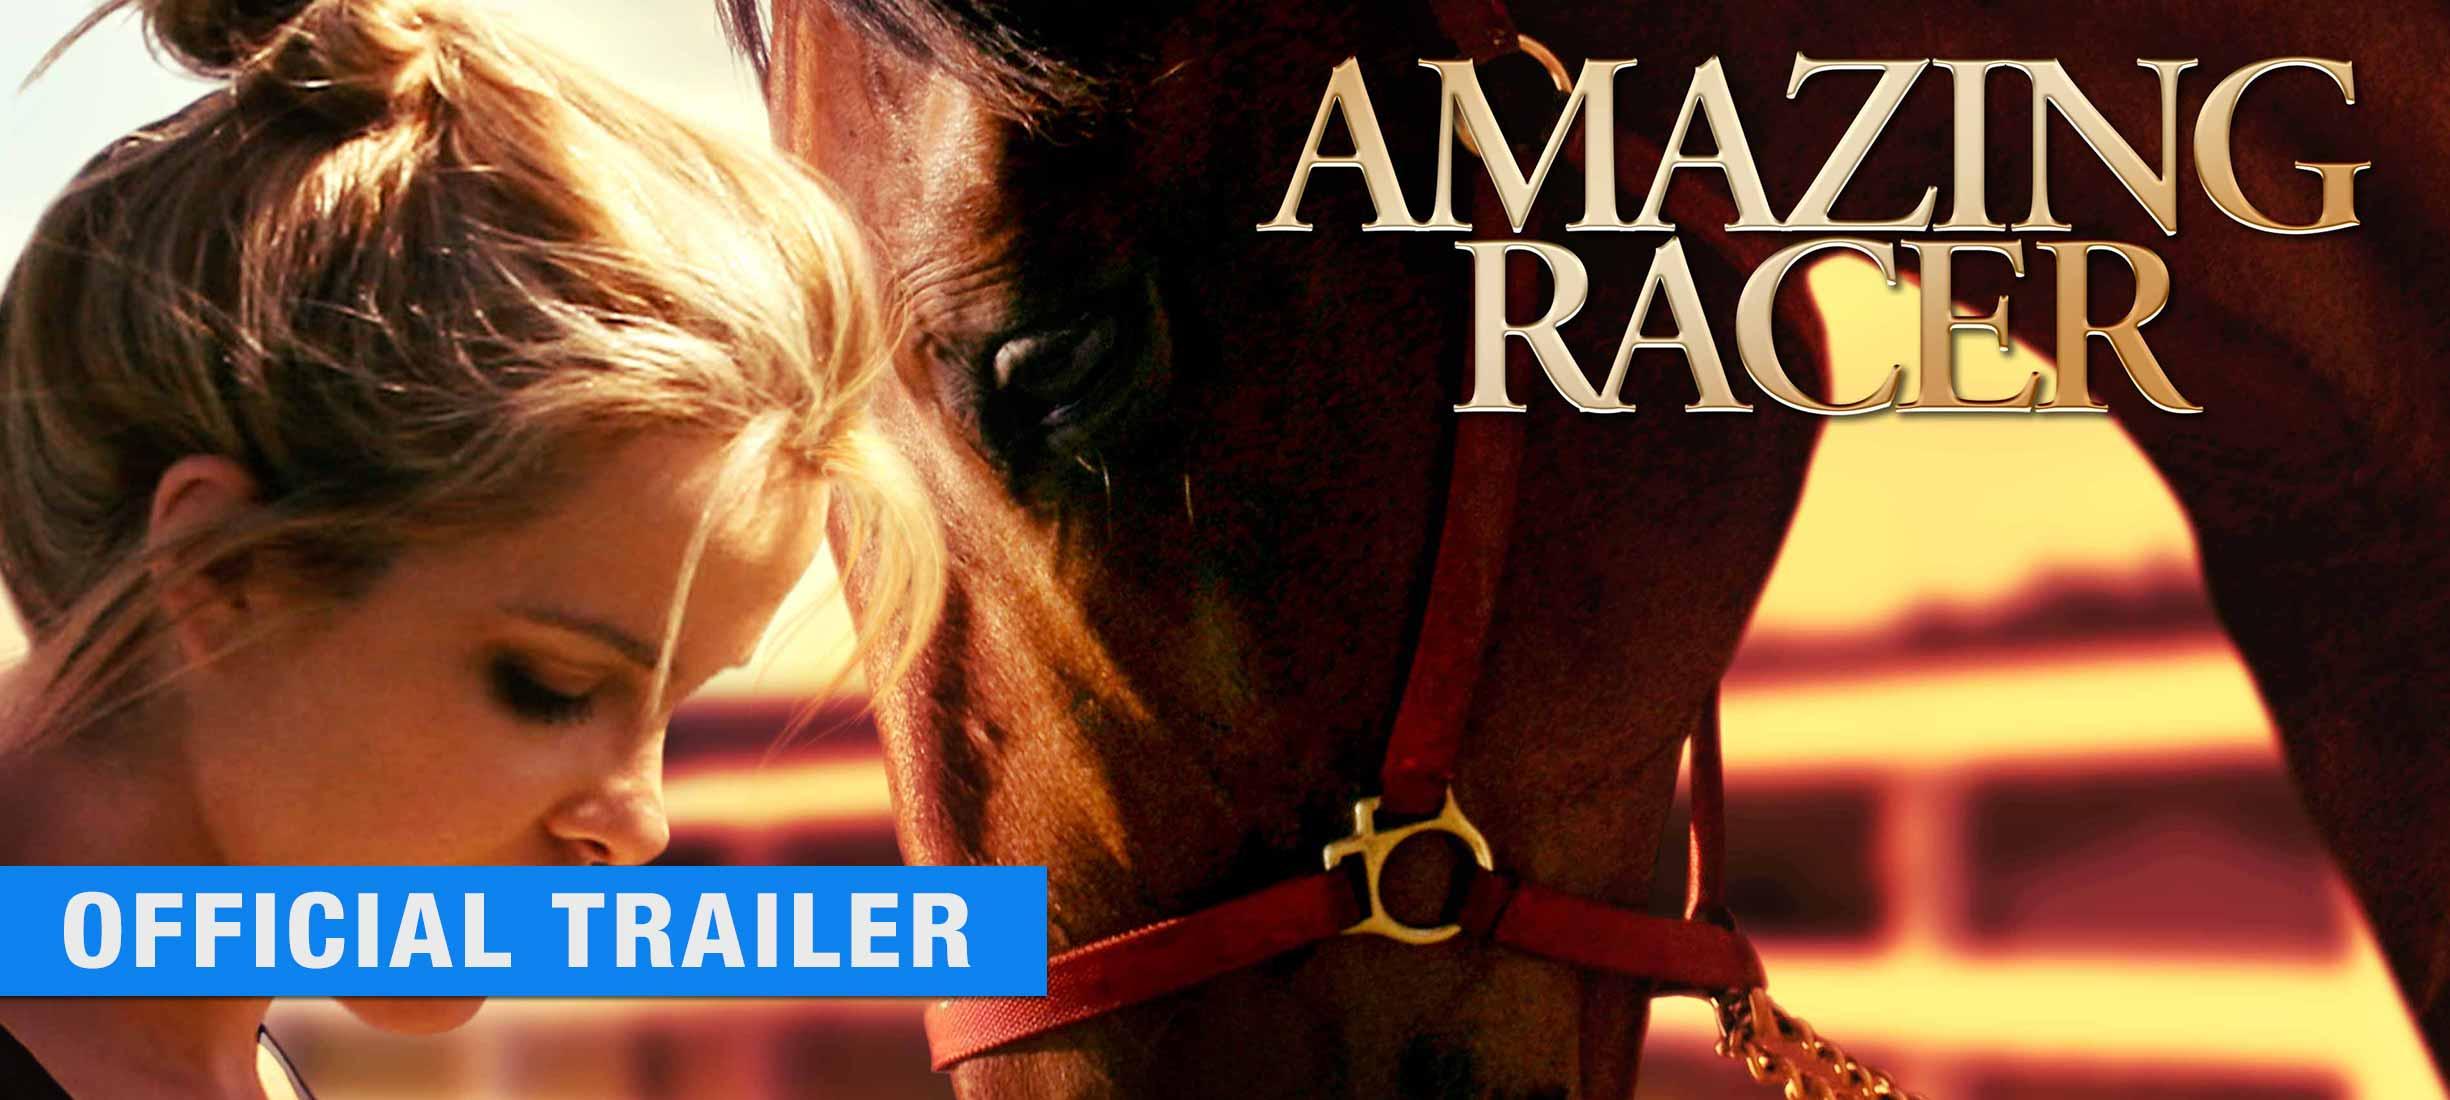 Amazing Racer: Trailer